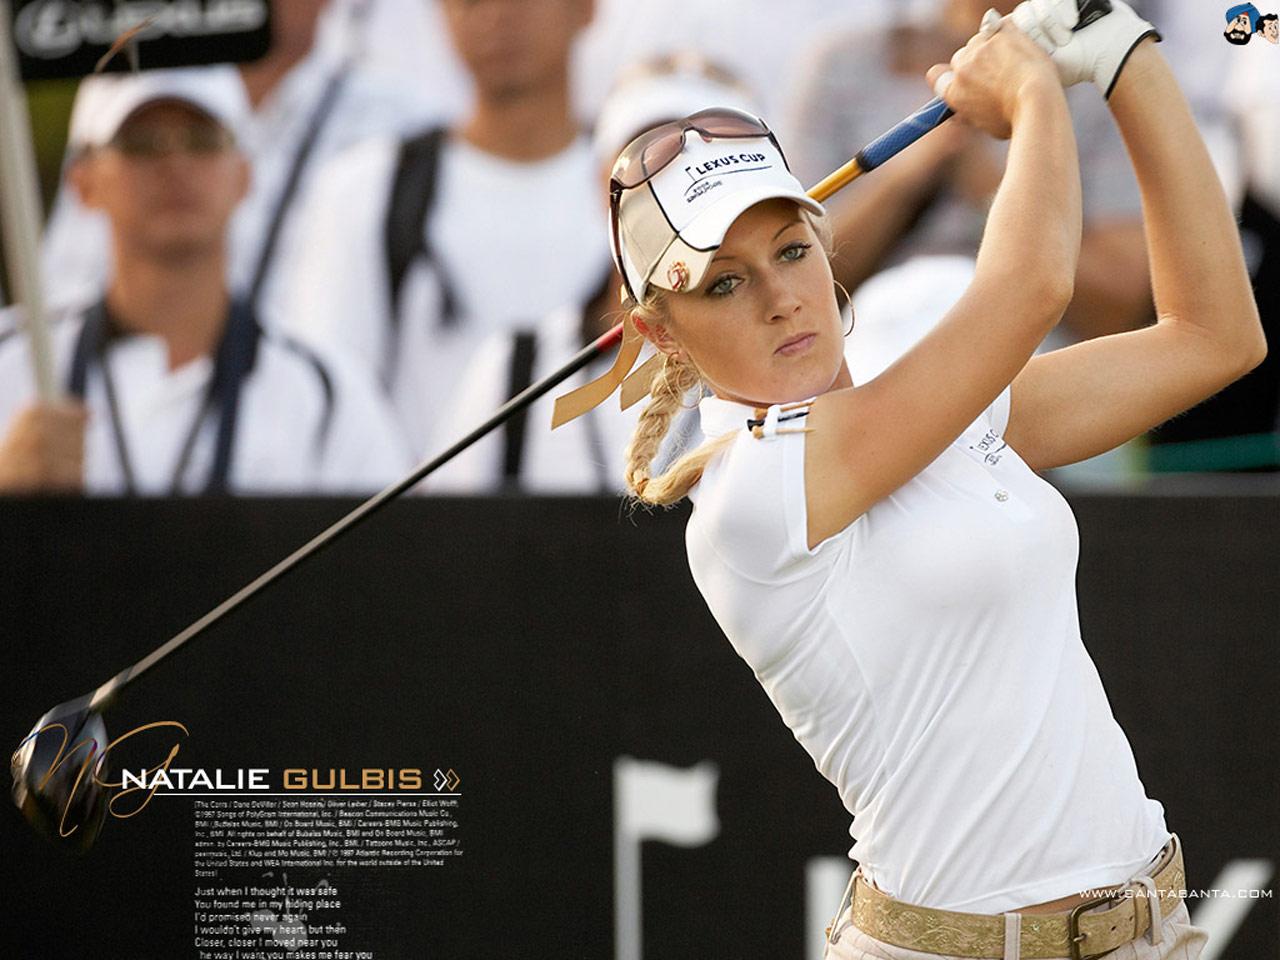 Paula Creamer vs. Natalie Gulbis - Page 14 - Tour Talk - The Sand Trap .com